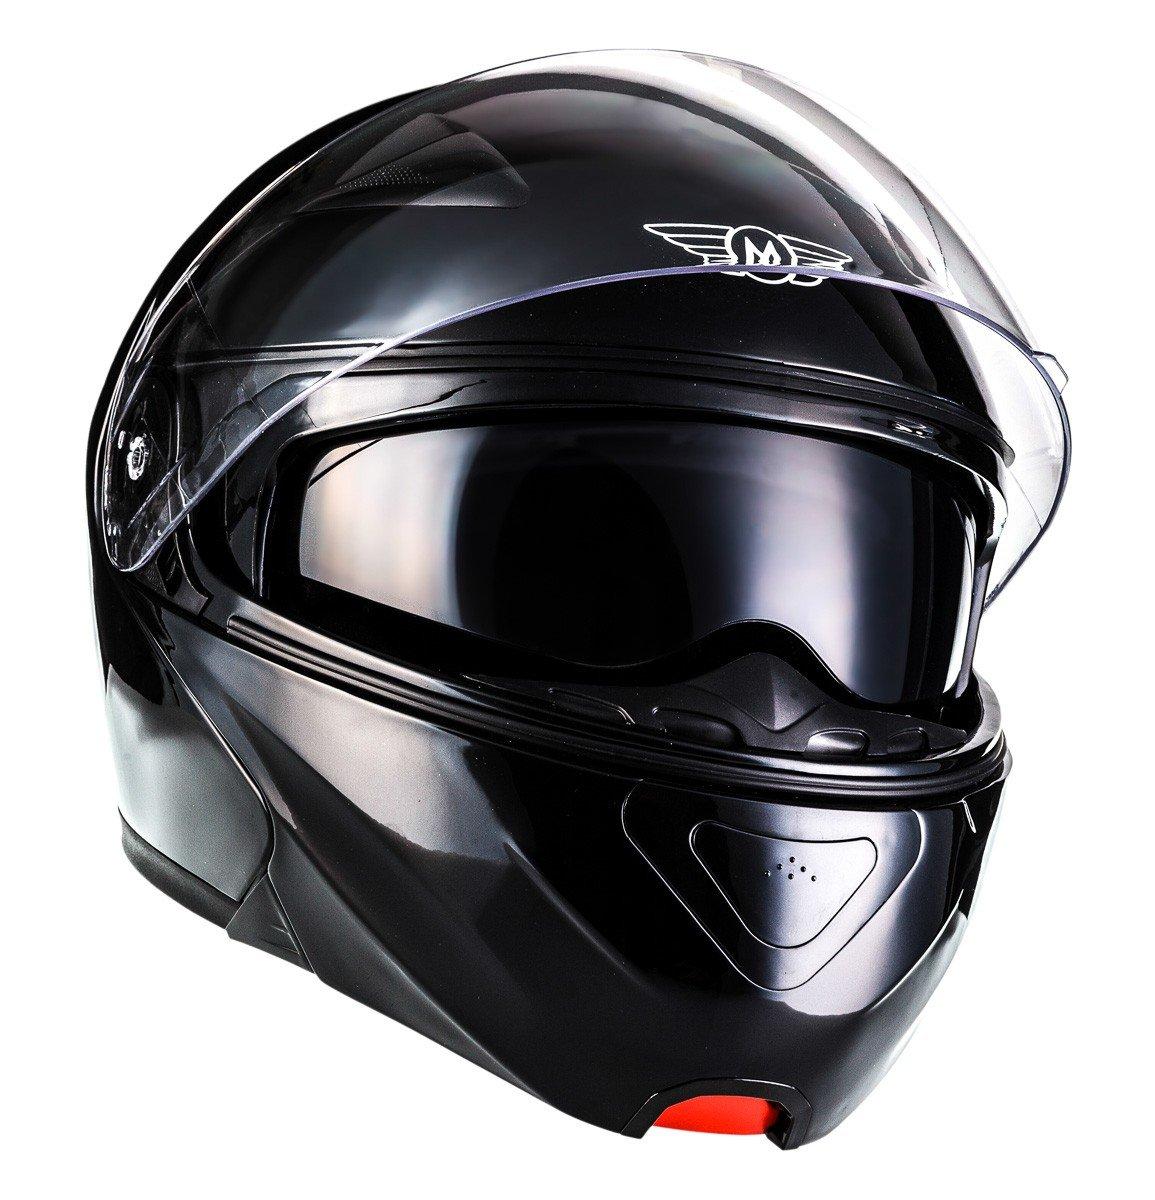 MOTO HELMETS/® F19 Gloss Black /· Motorrad-Helm Klapp-Helm Modular-Helm Flip-up Integral-Helm Motorrad-Helm Roller-Helm Full-Face Cruiser /· ECE Sonnenvisier Schnellverschluss bolsillo XS-XL 53-62 cm